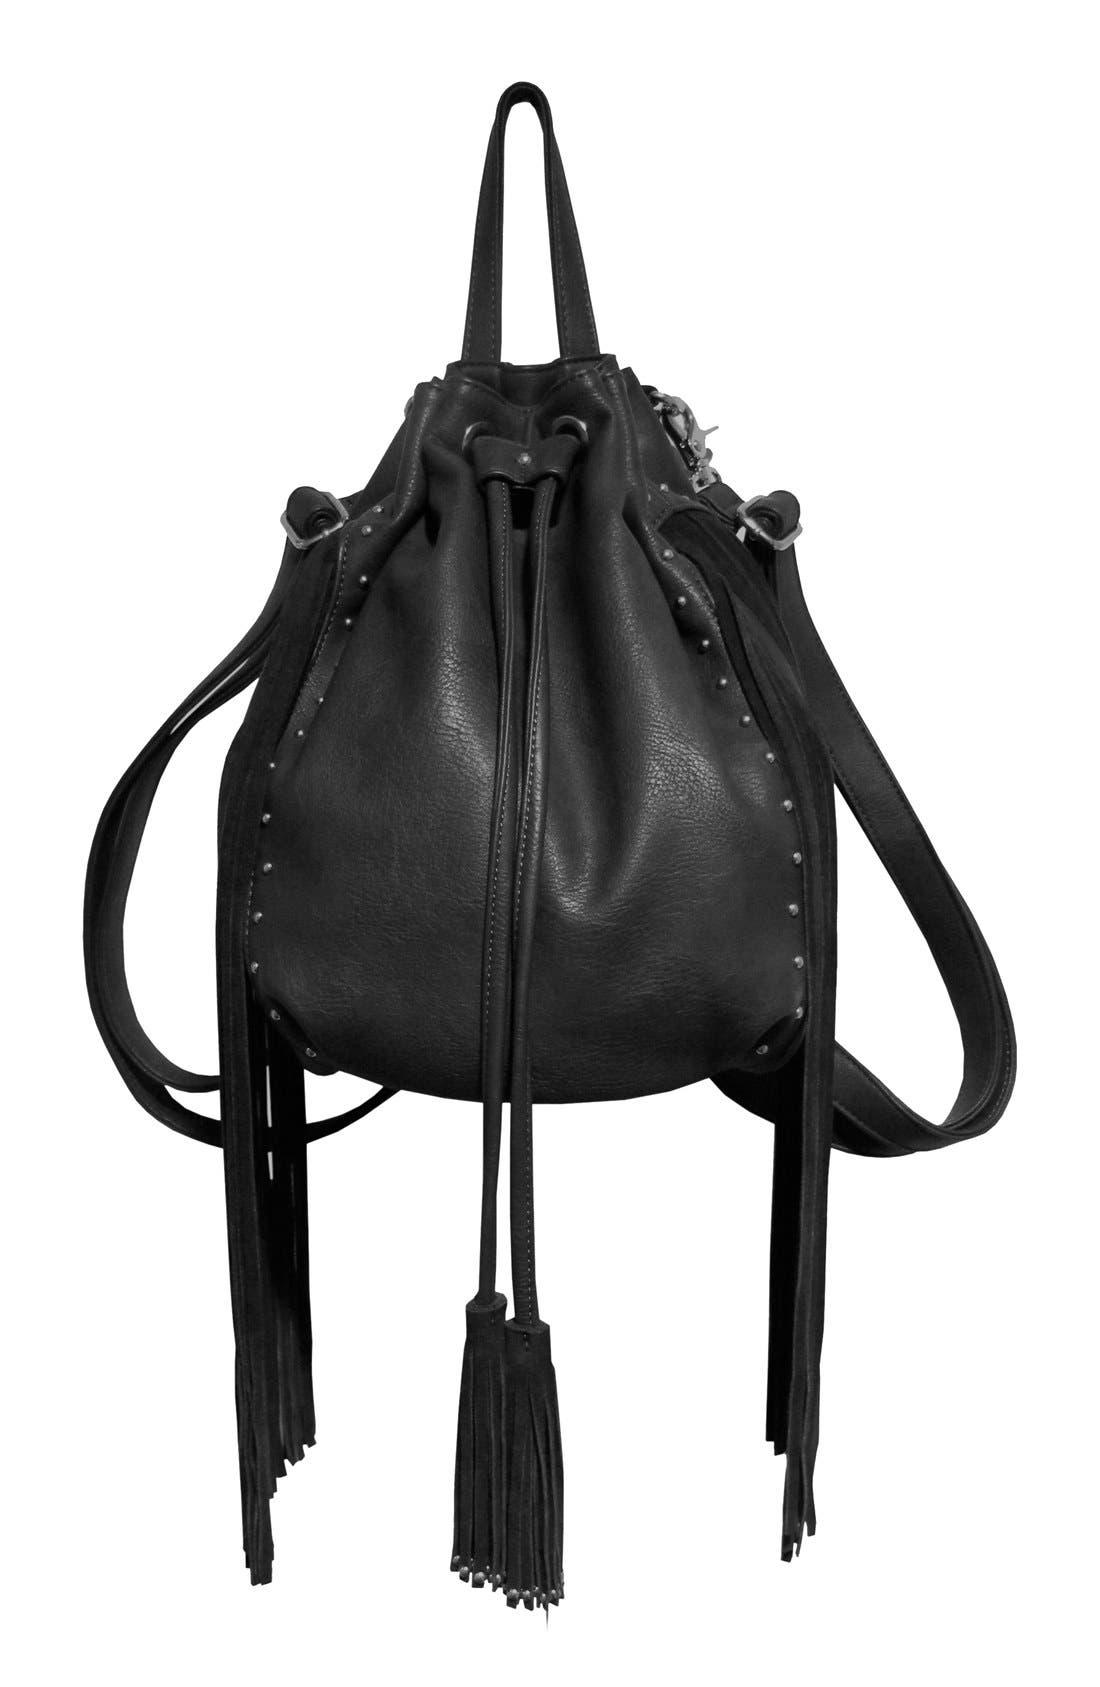 Main Image - Urban Originals 'Forbidden' Convertible Drawstring Backpack